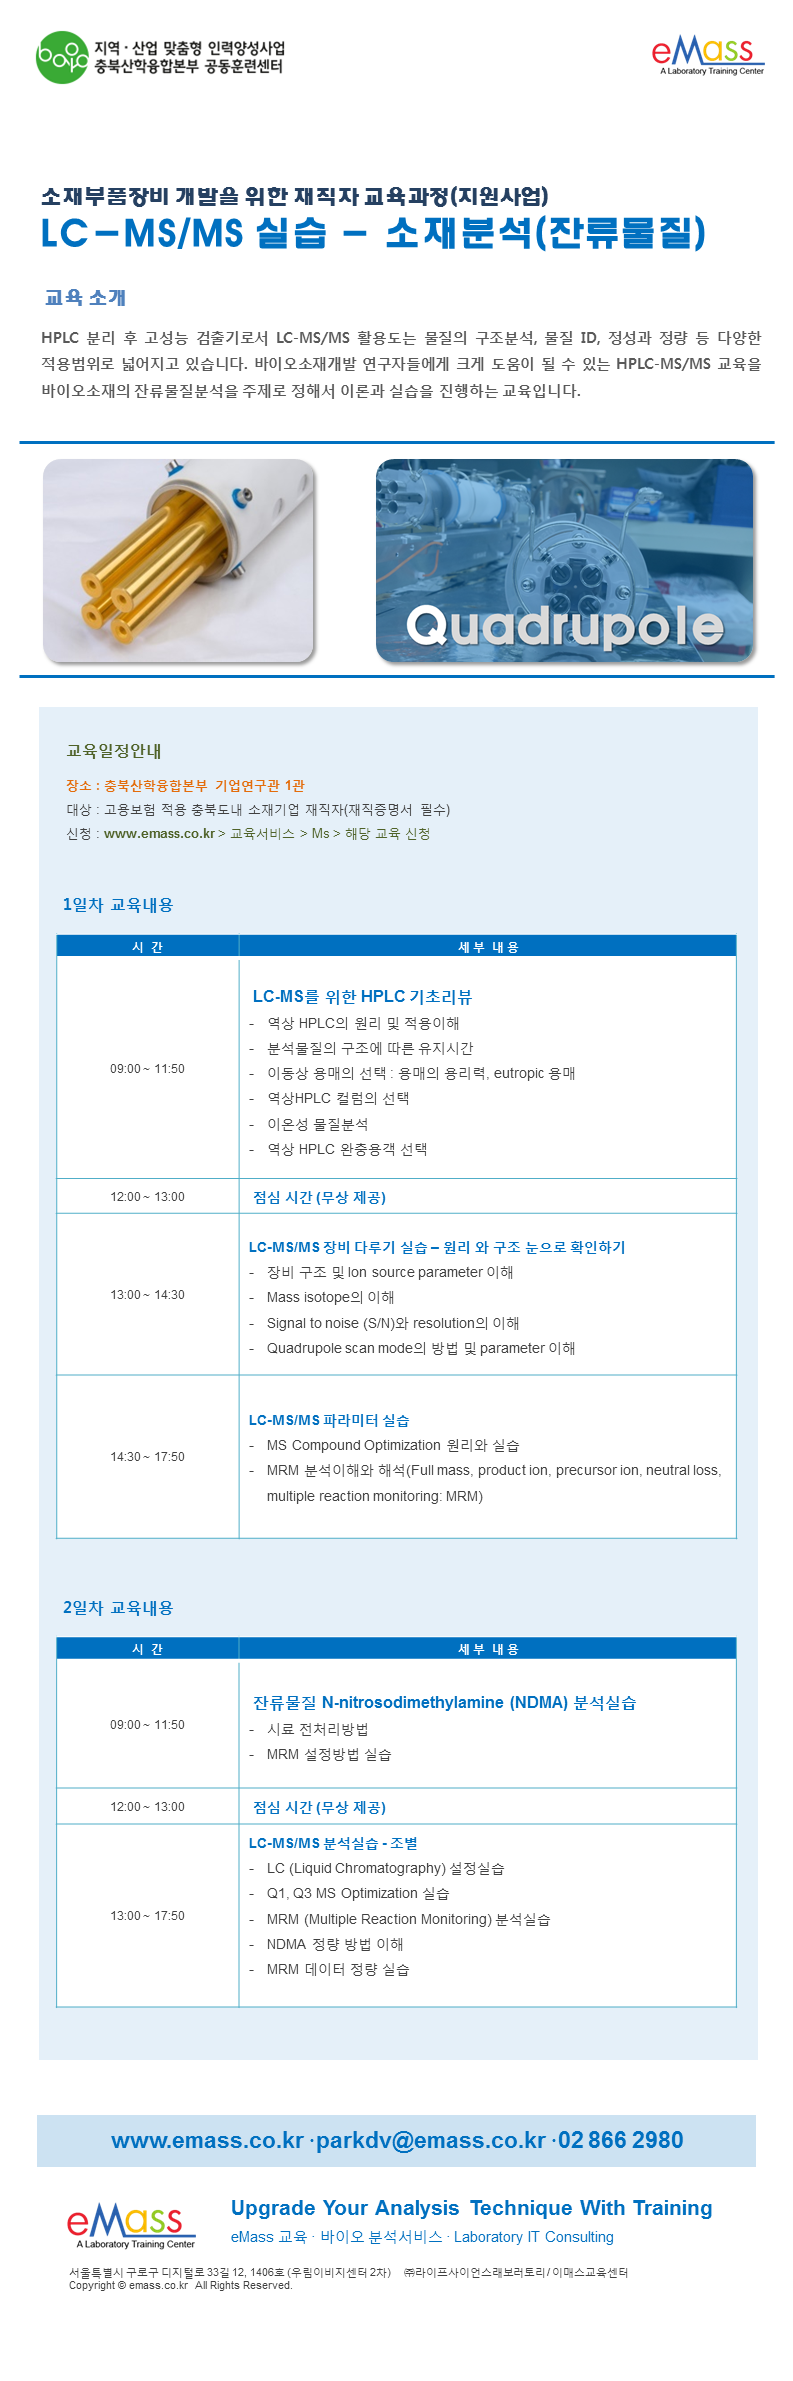 LCMS - 20191217 충북융합위탁과정안.png